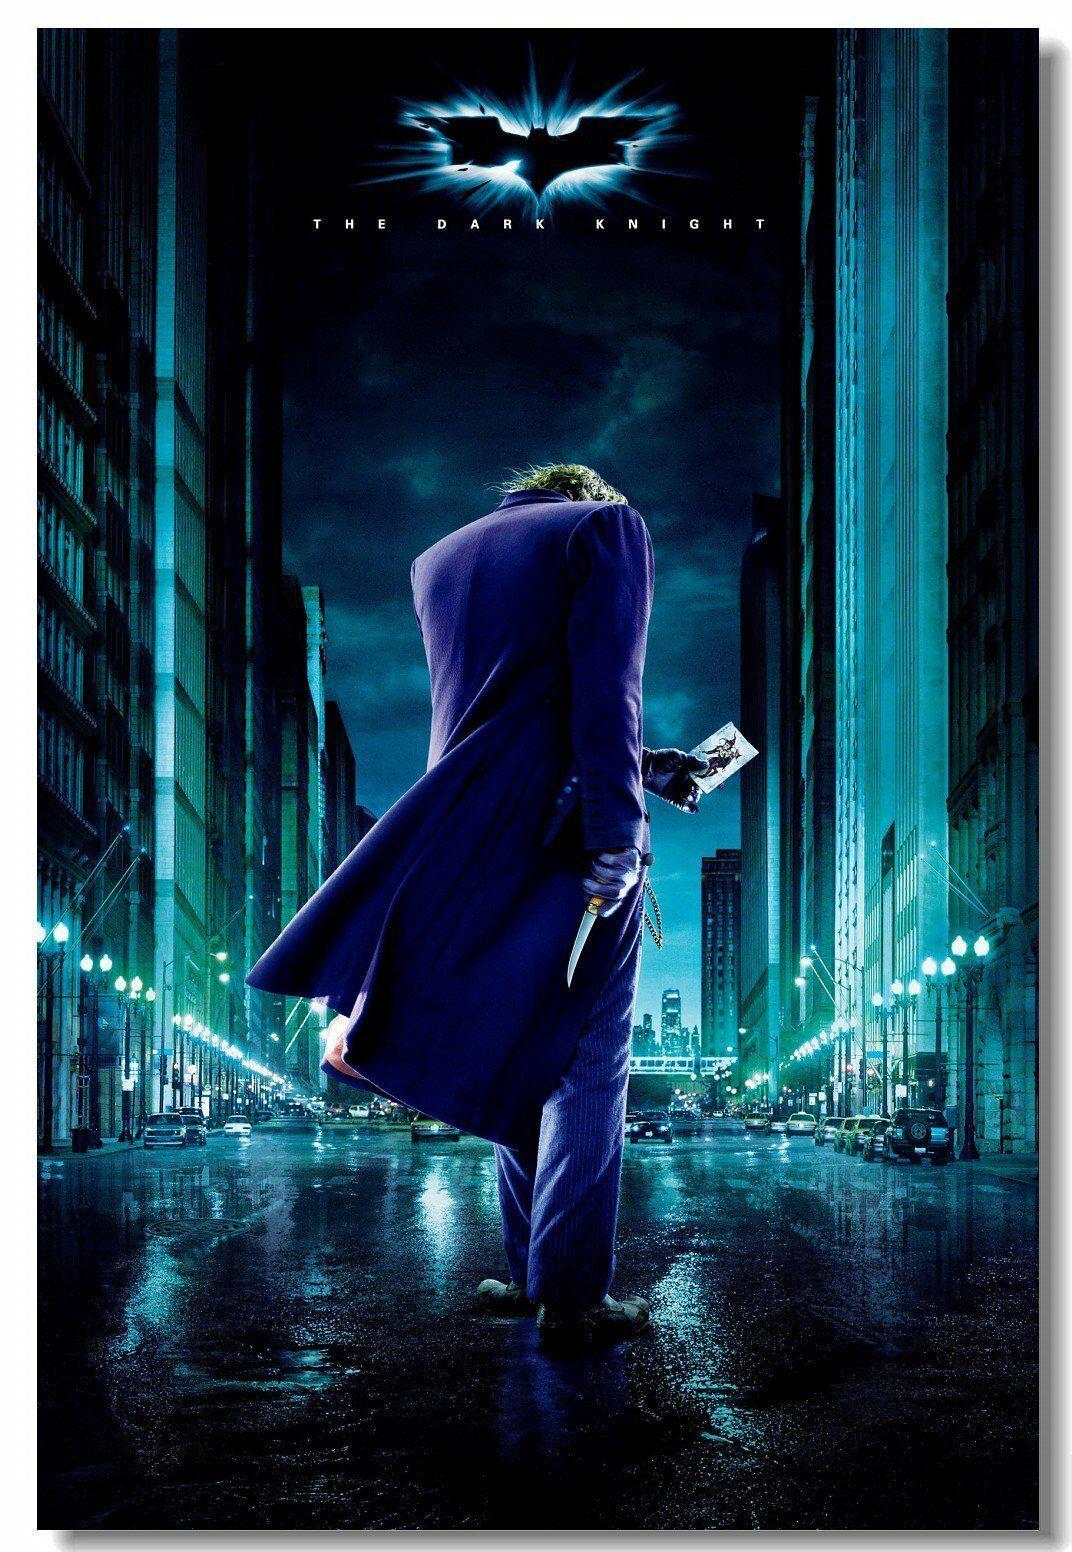 The Dark Knight Rises Return Joker Movie TDK Movie 2012 Cat Poster Print 512